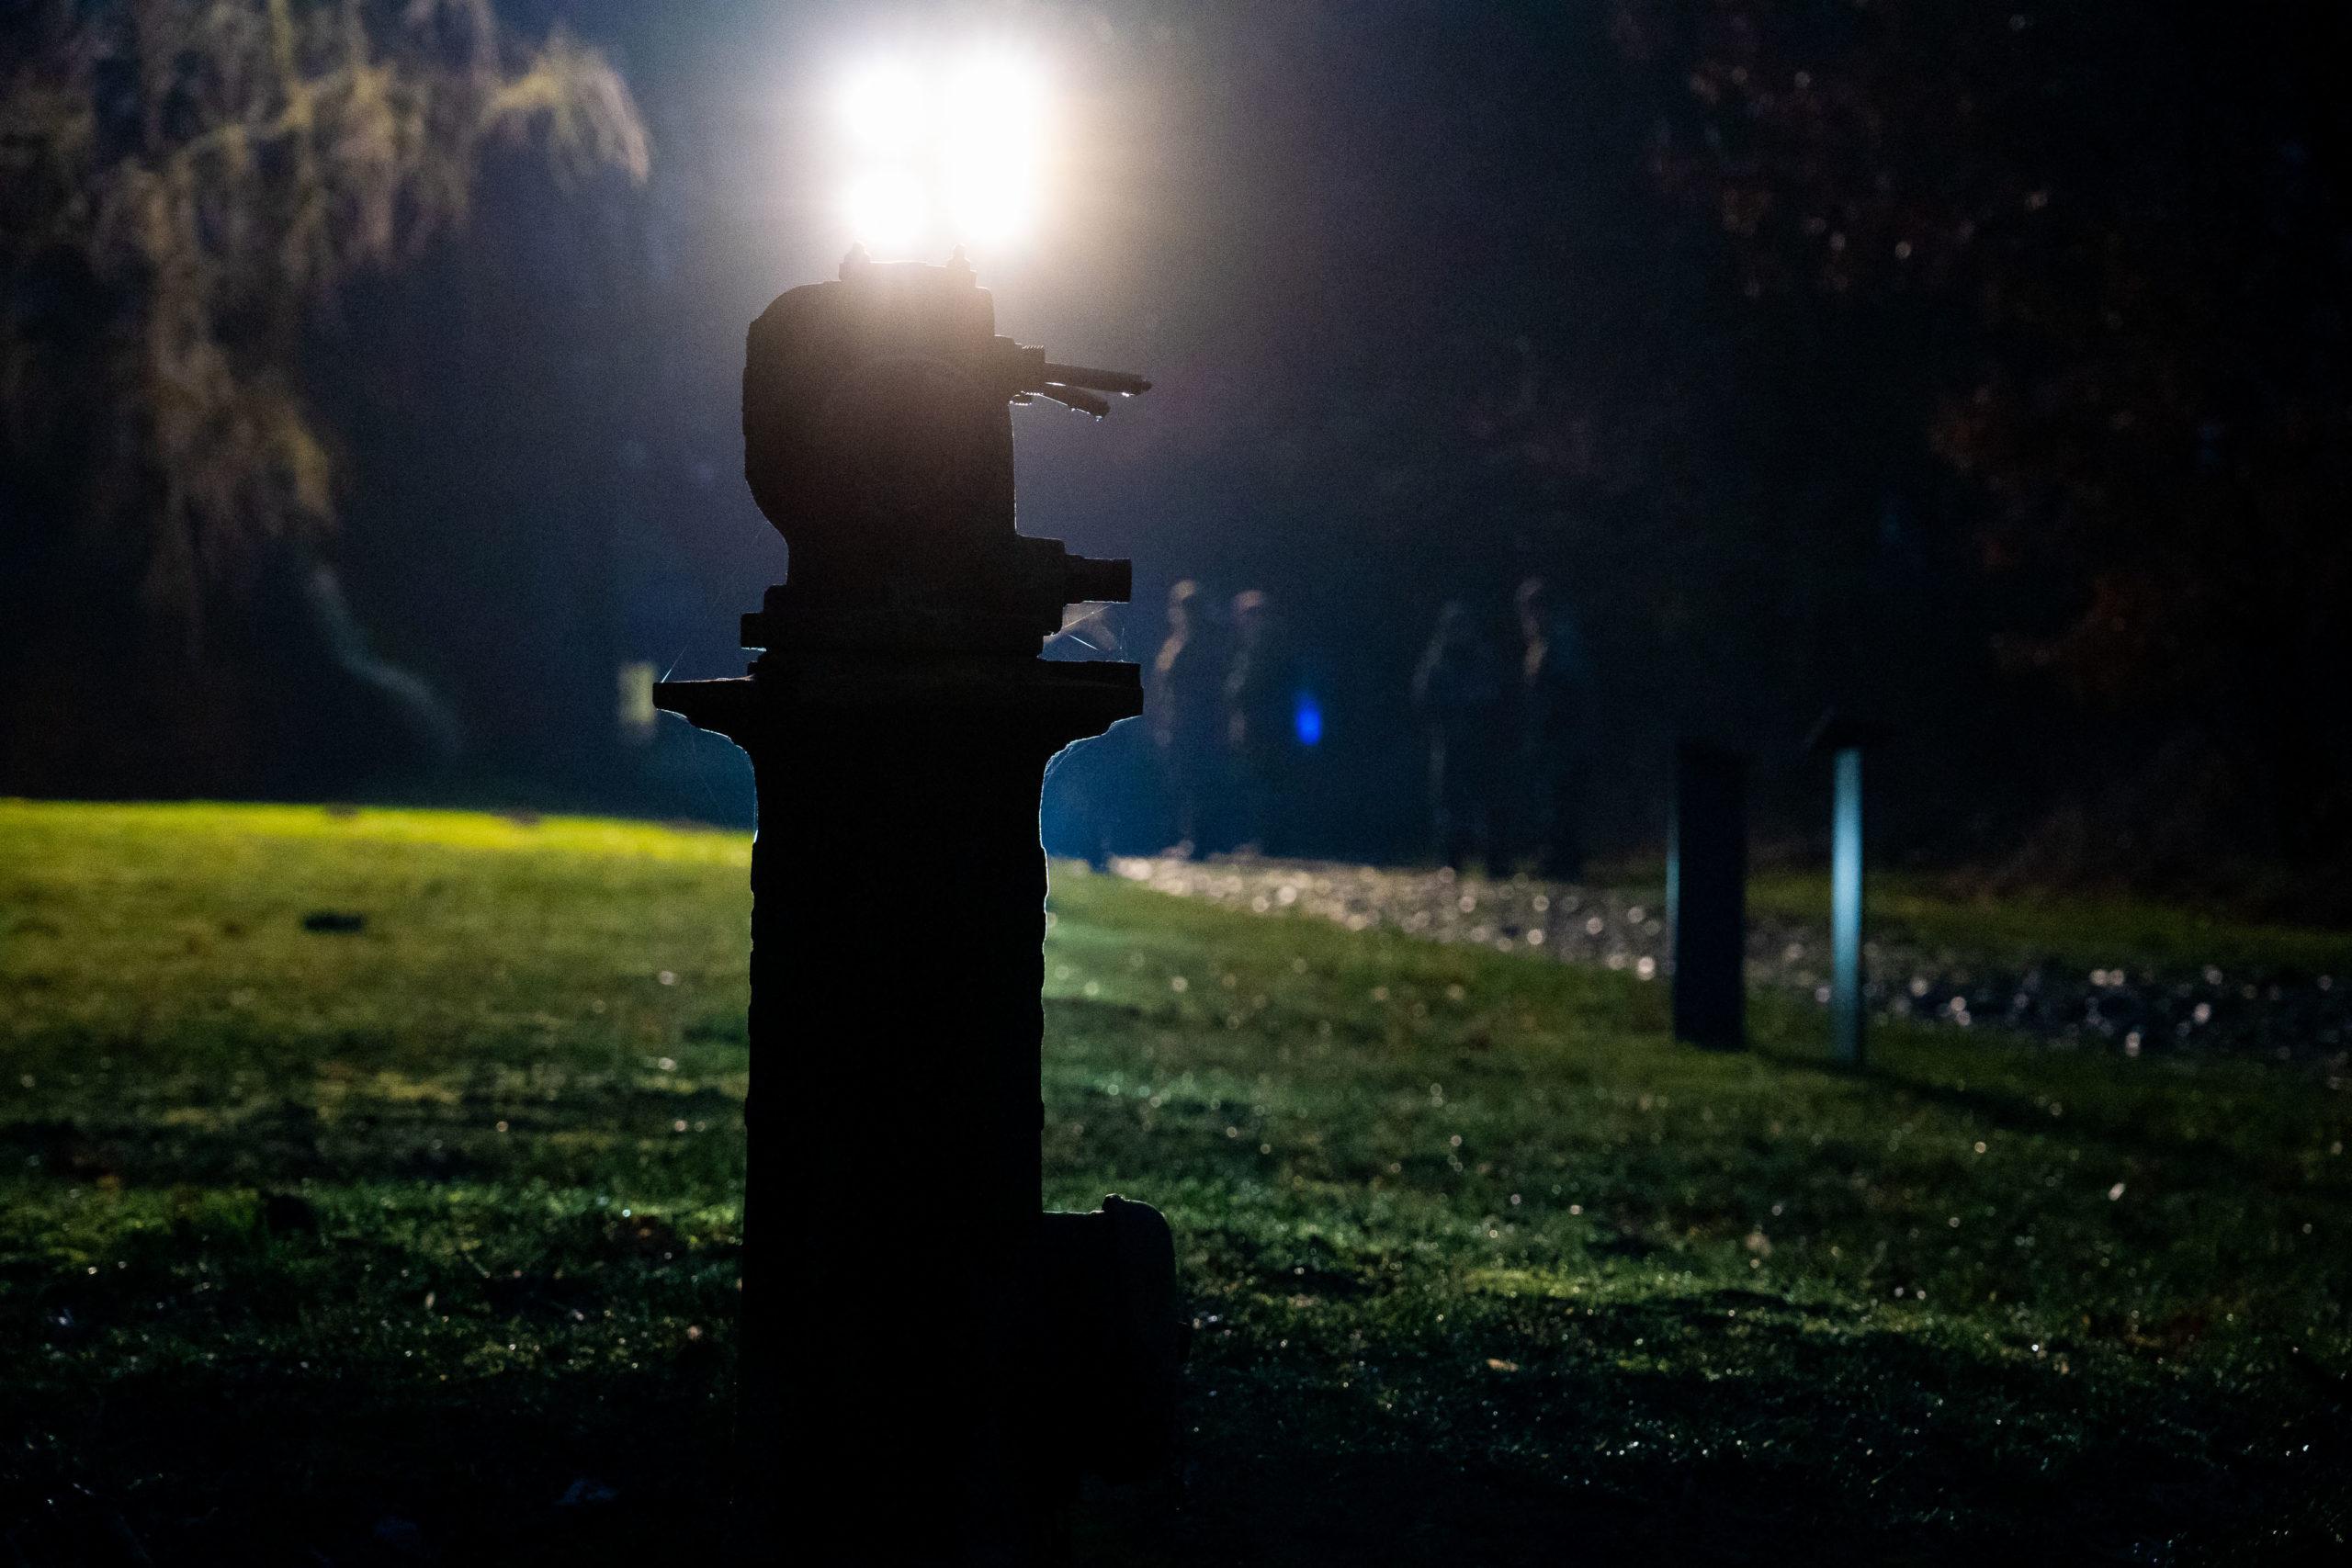 #Lichter-gegen-Dunkelheit_02